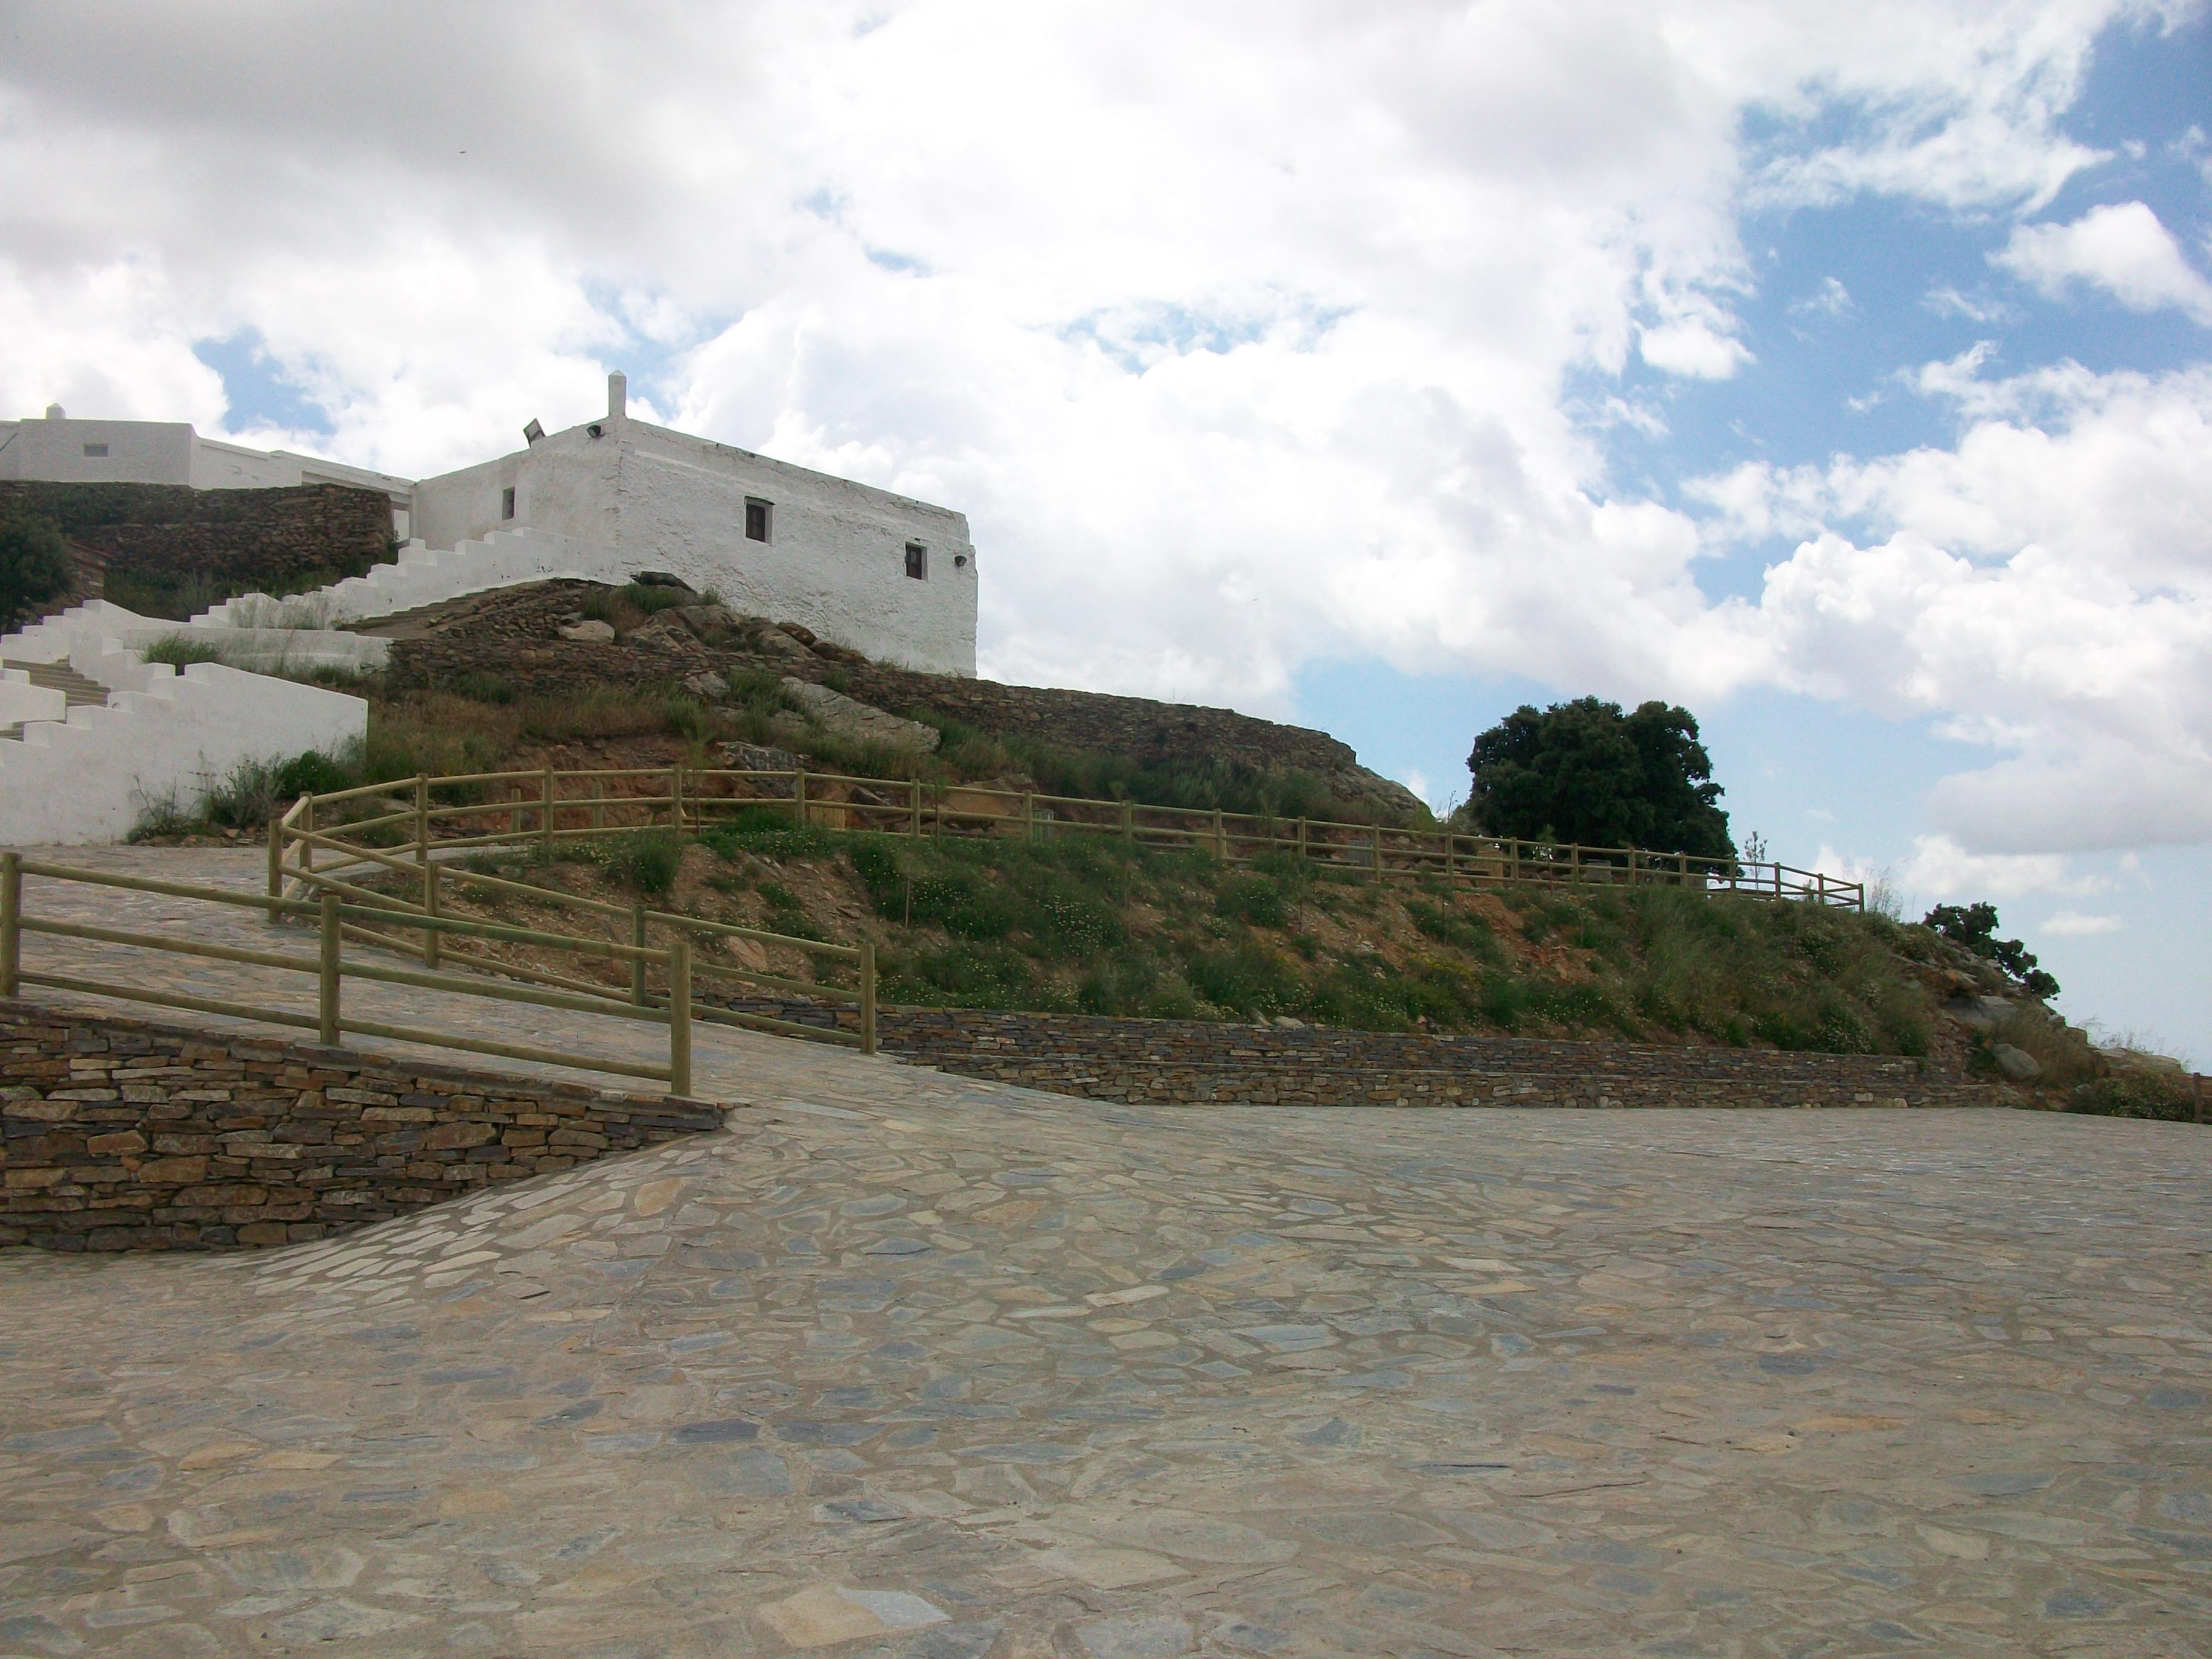 Santuario de Monteagud